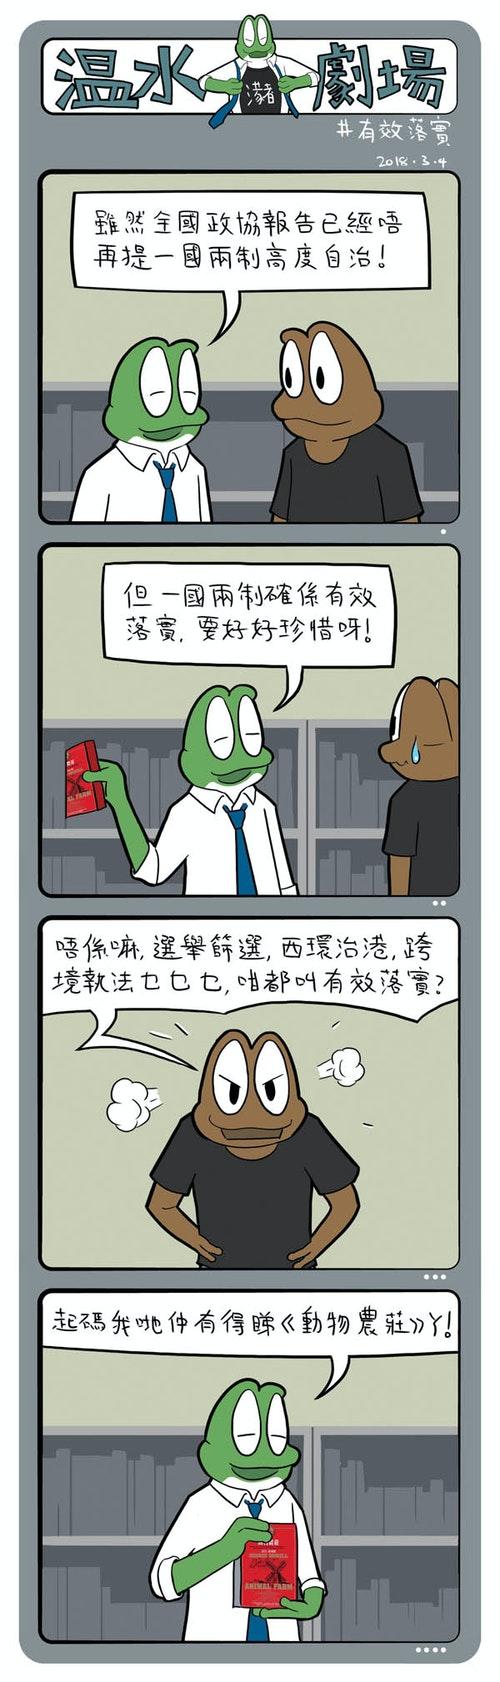 frog_news_lens_141_542